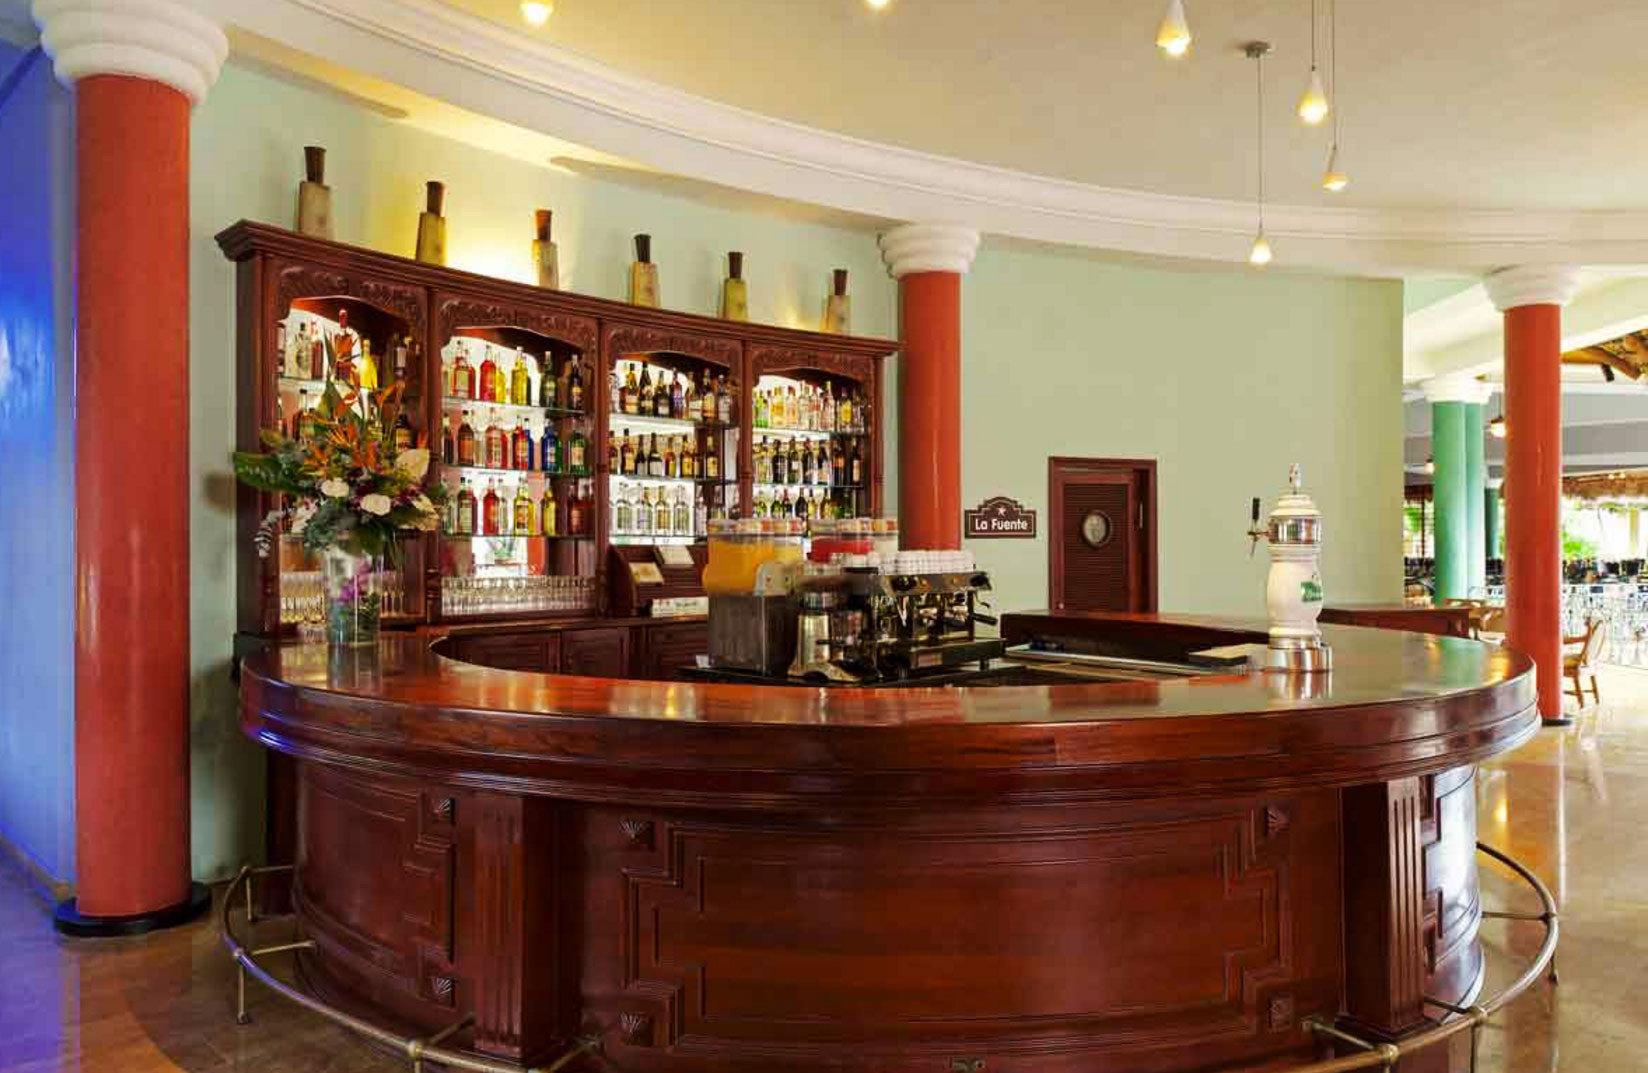 building Lobby Bar recreation room cabinetry Island